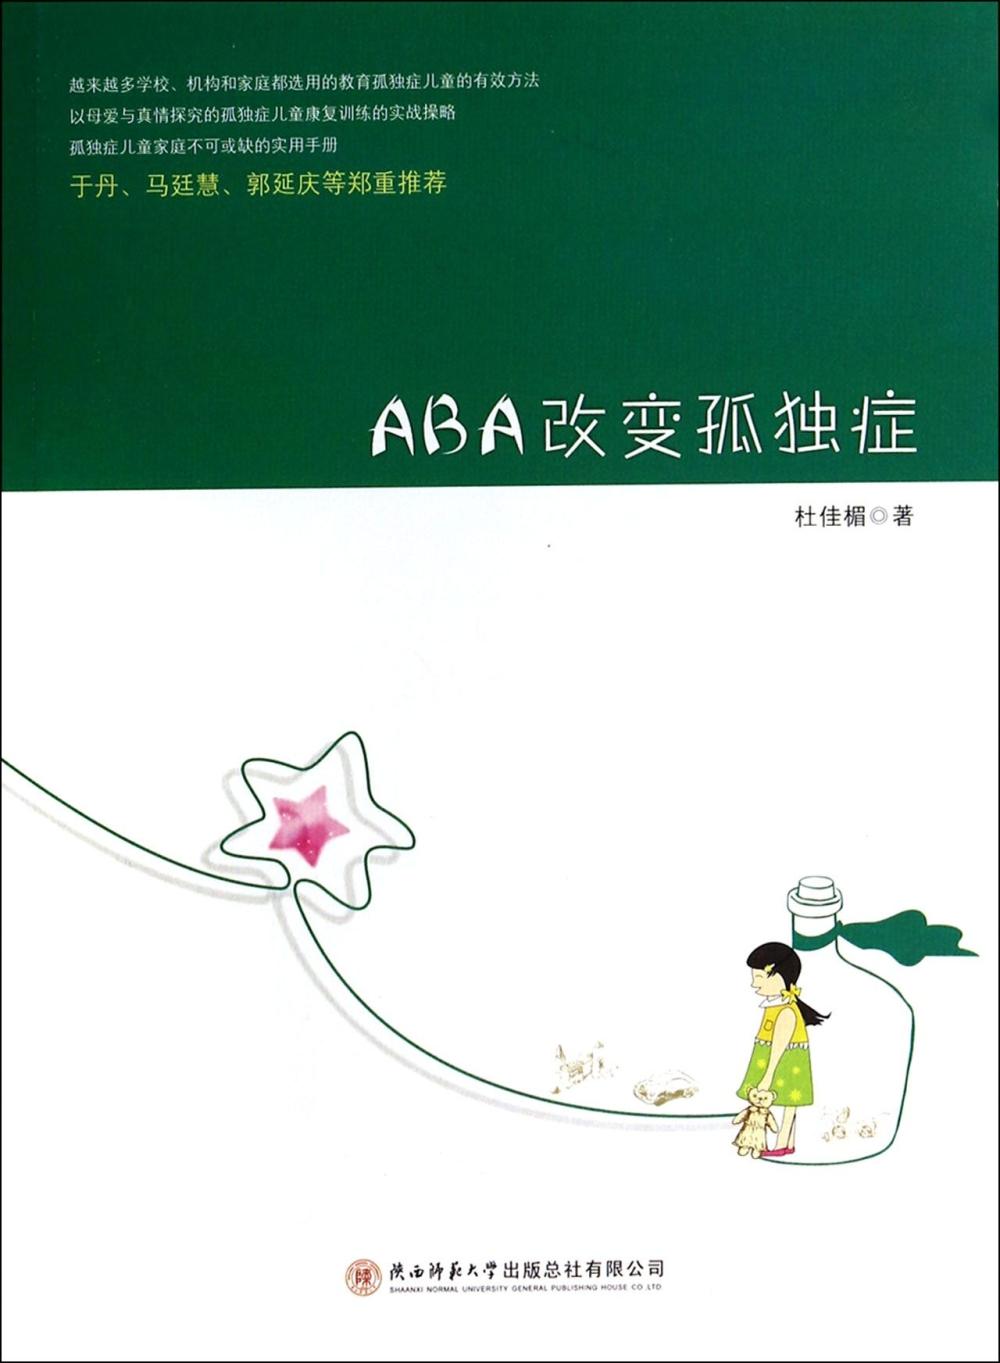 ABA改變孤獨症